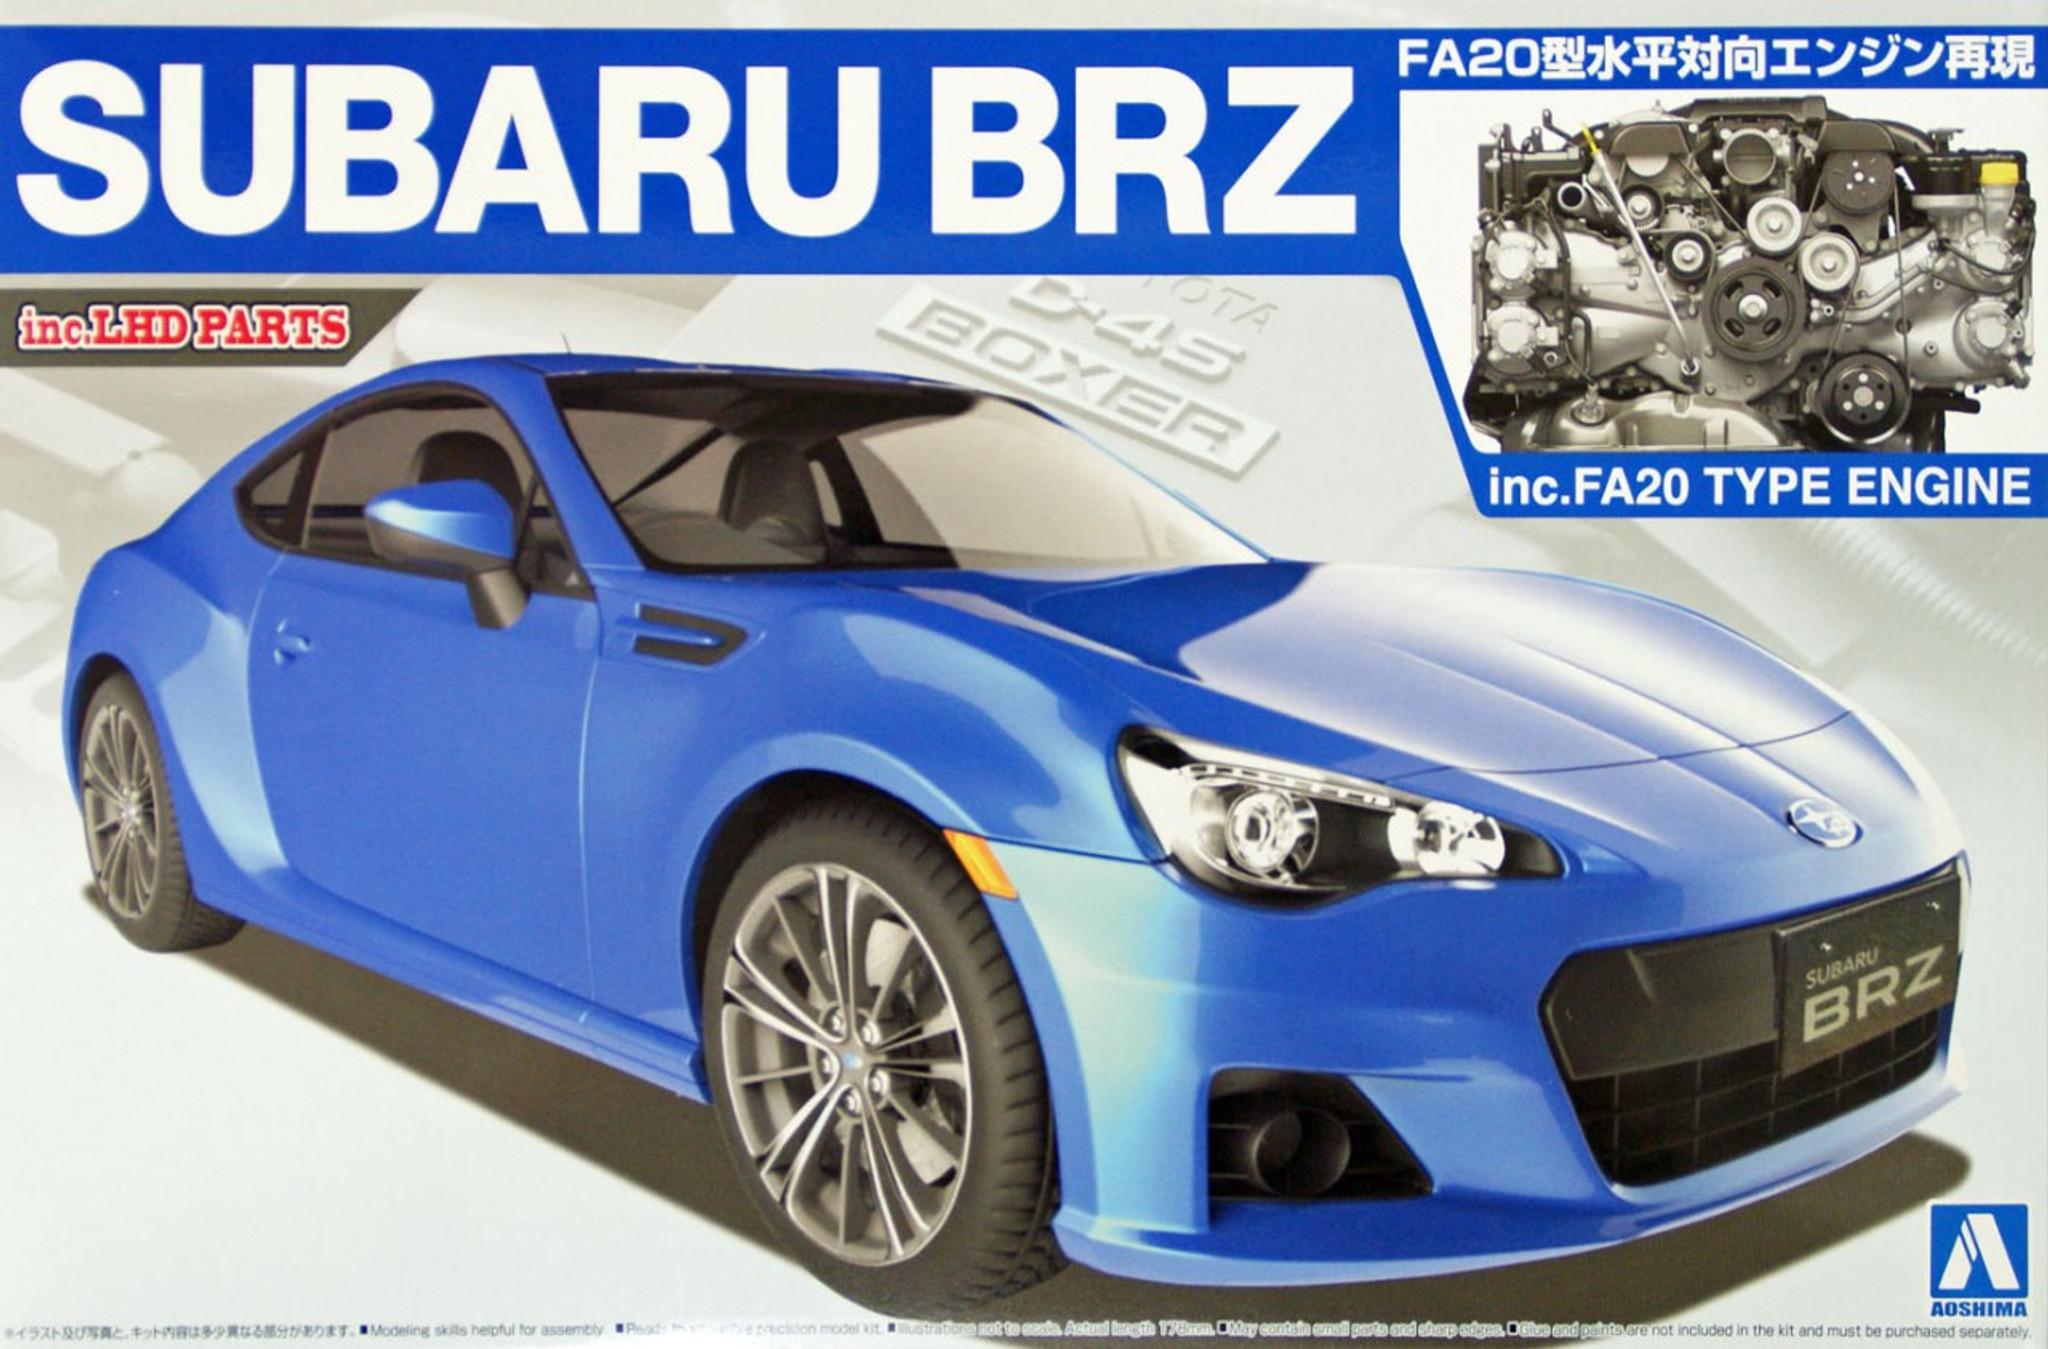 All Types brz sti parts : Aoshima 07617 Subaru BRZ with FA20 Type Engine (inc. LHD parts) 1 ...